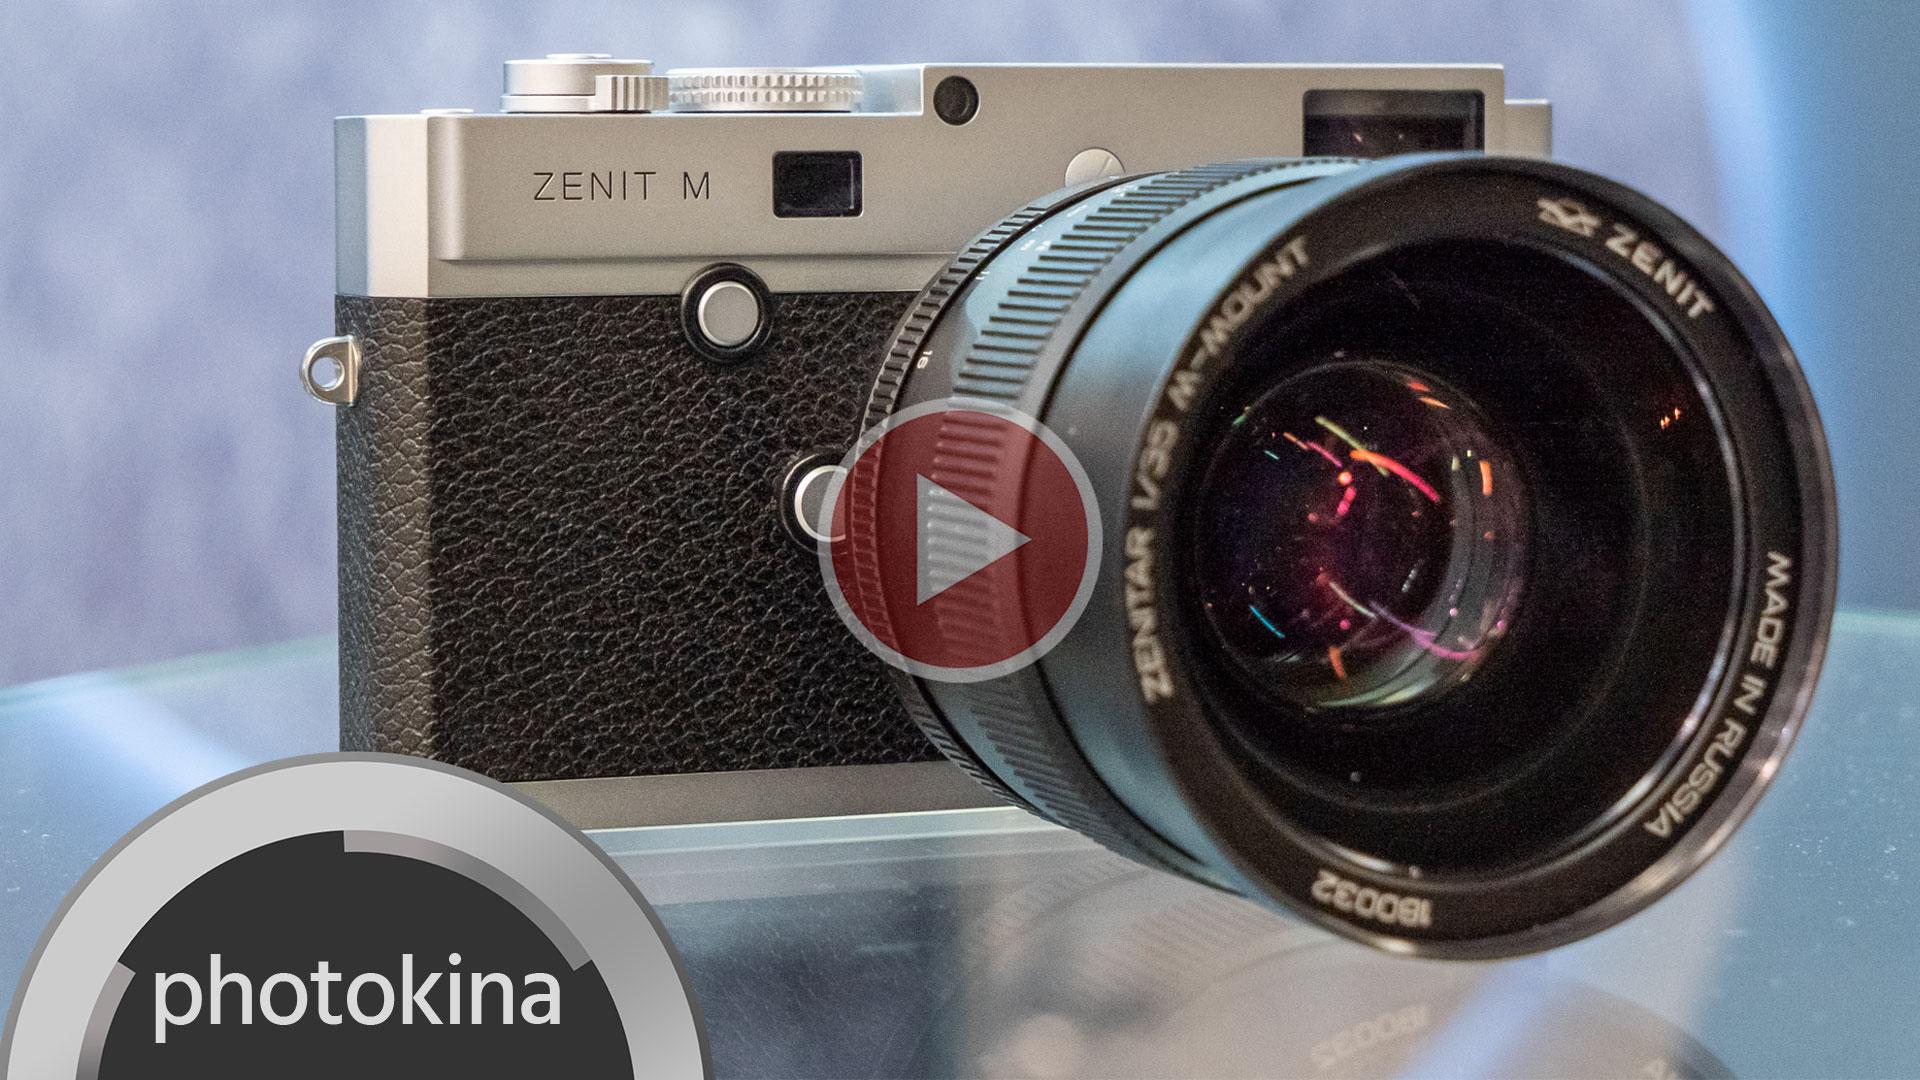 Zenit M con lente 35mm F/1.0 – La legendaria marca rusa ingresa a la era digital – Entrevista e imágenes